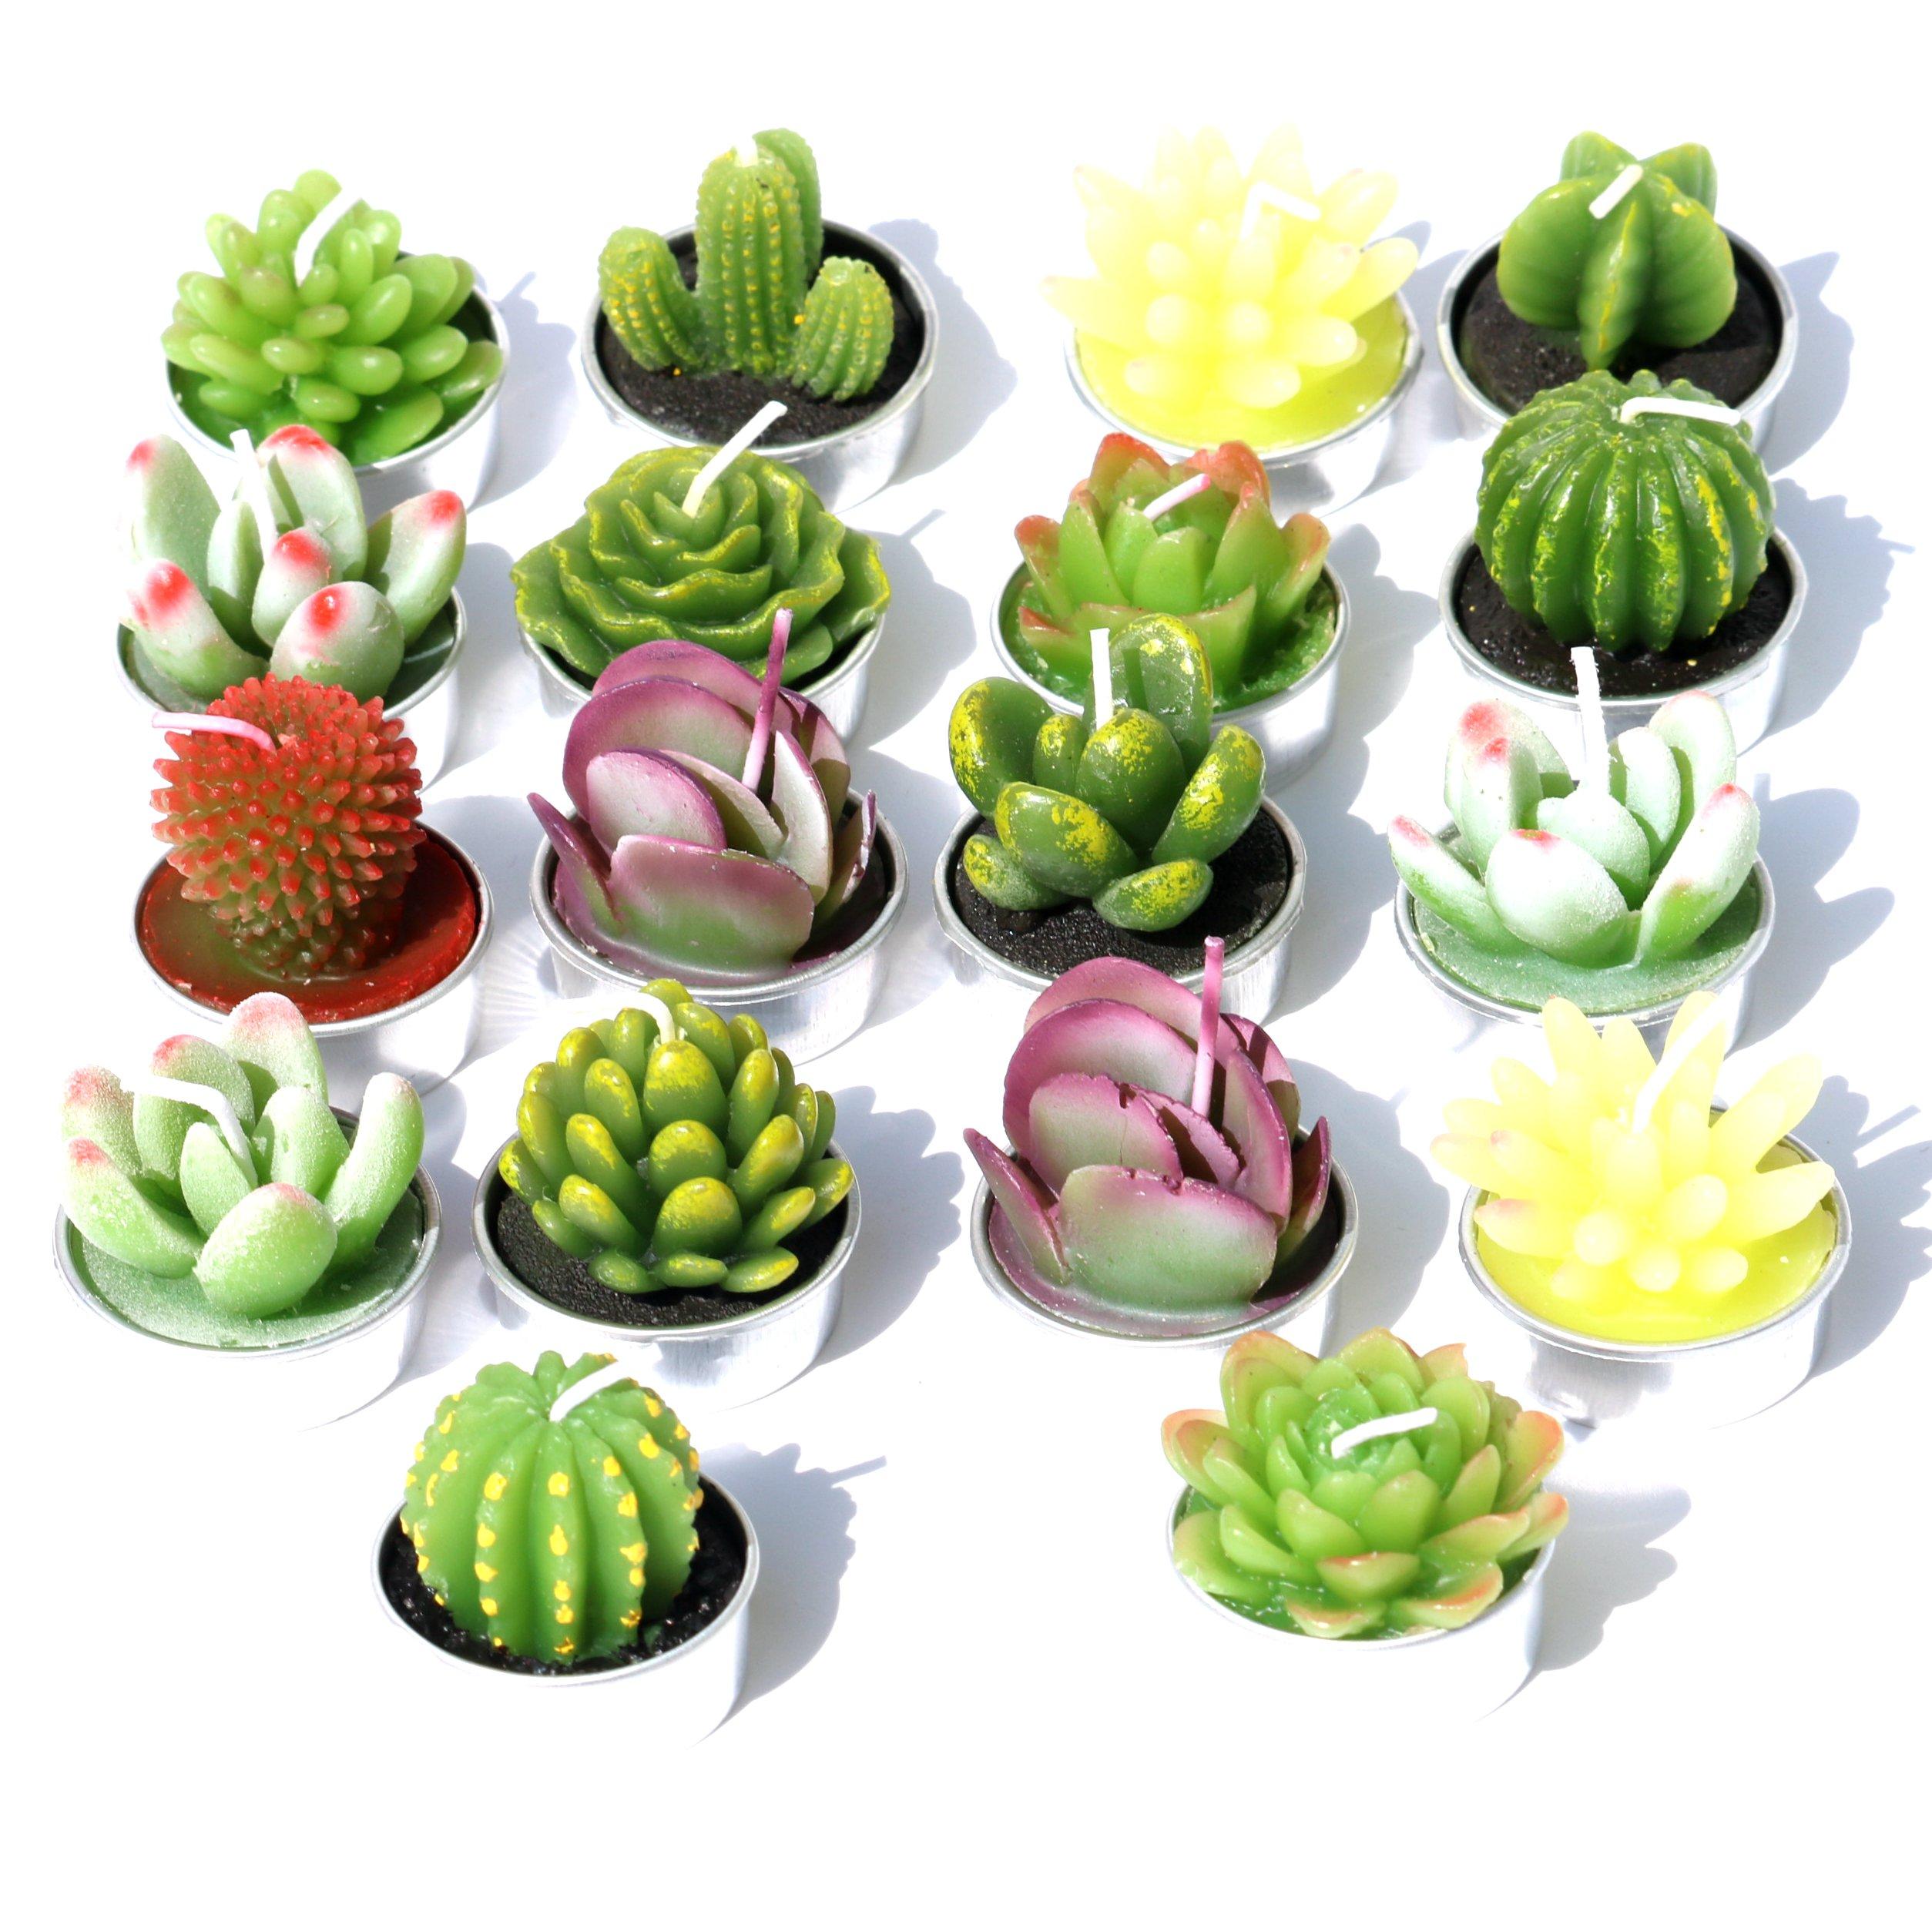 AI·X·IANG AiXiAng Handmade Delicate Cactus Candles for Home Decorative Cactus Candles Tea Light Candles 18 Pcs